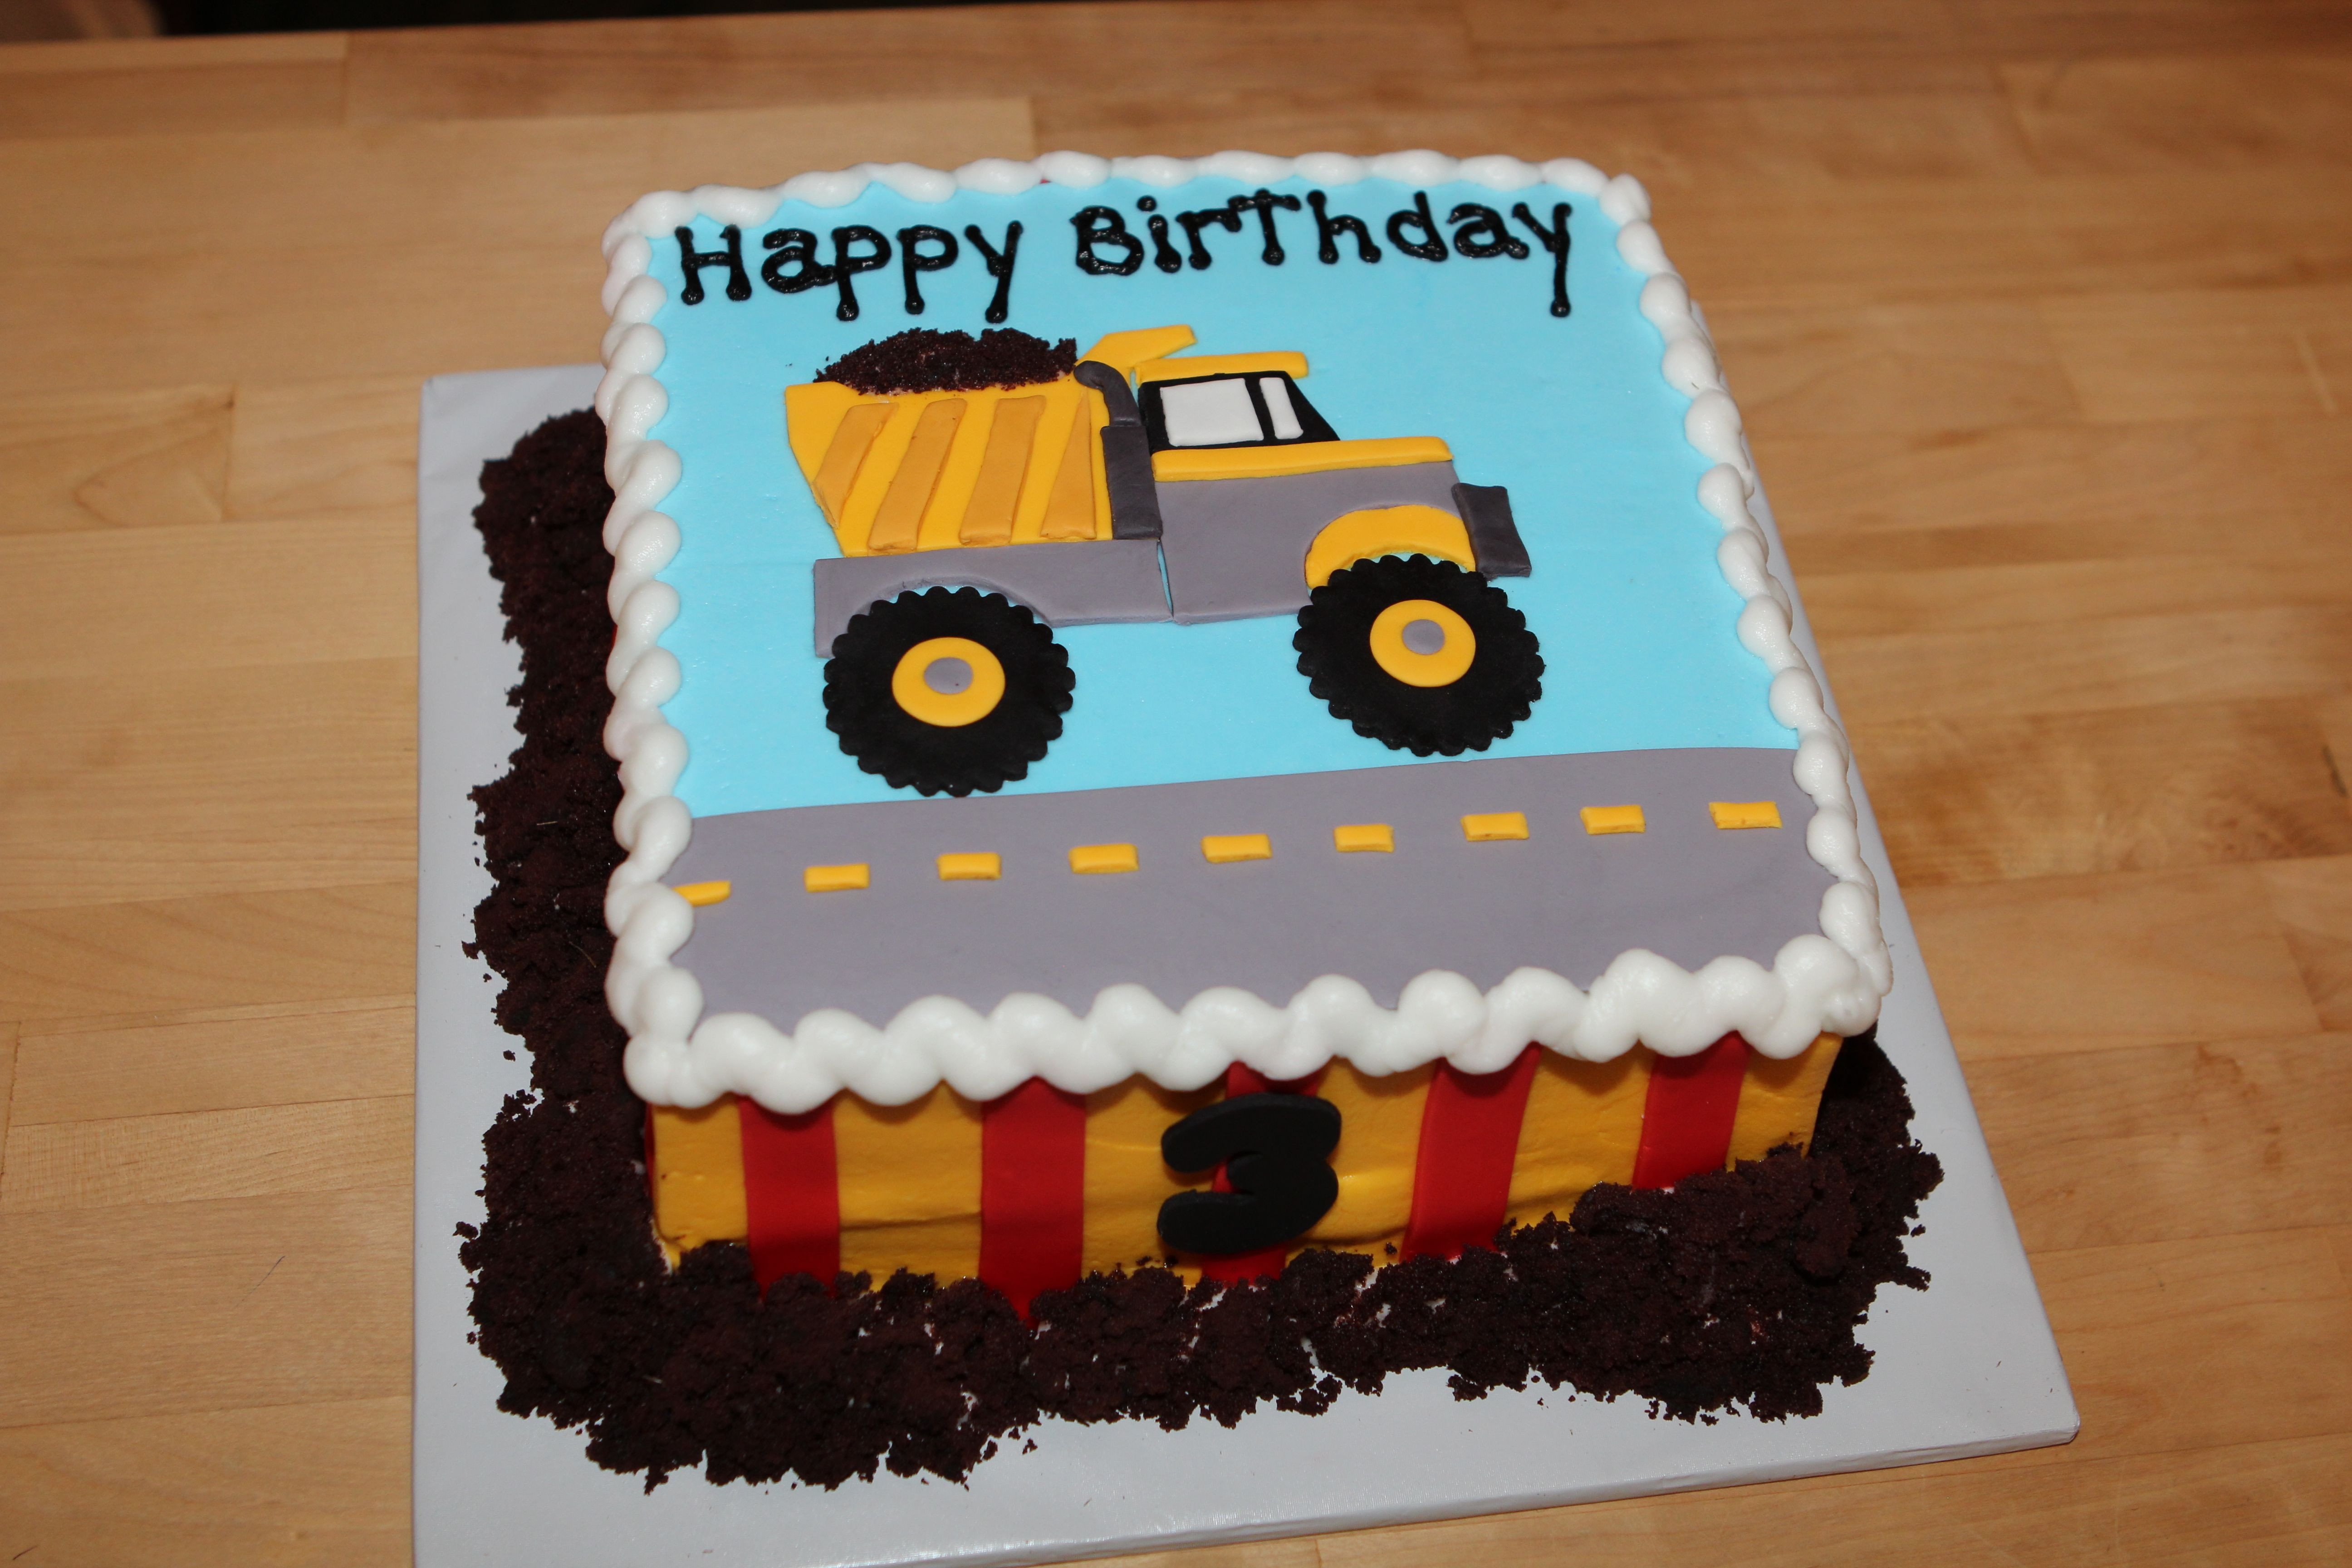 Phenomenal Dump Truck Cake For Our Sons 3Rd Birthday Birthday Sheet Cakes Personalised Birthday Cards Beptaeletsinfo